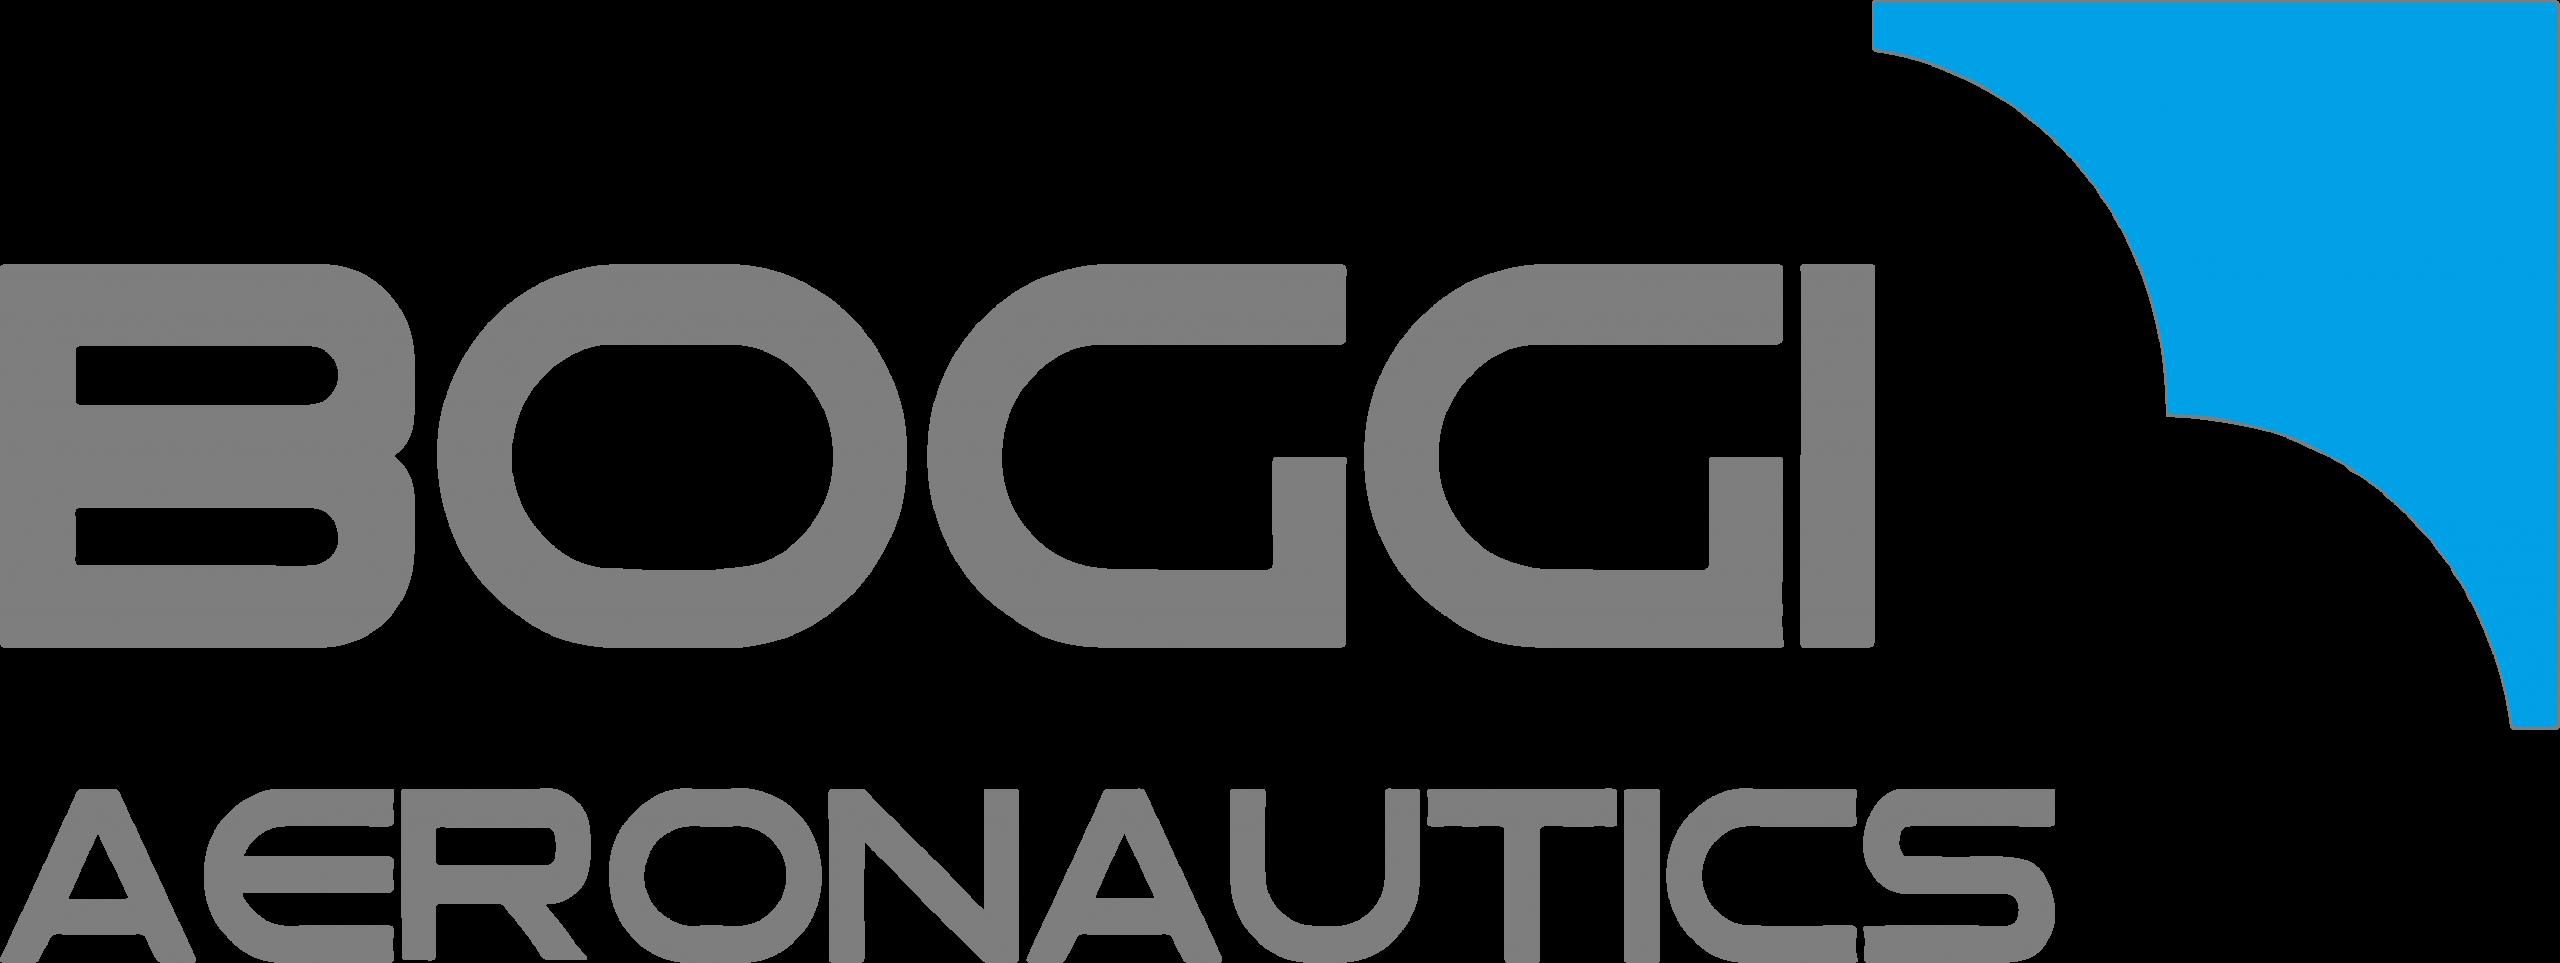 Boggi aeronautics logo